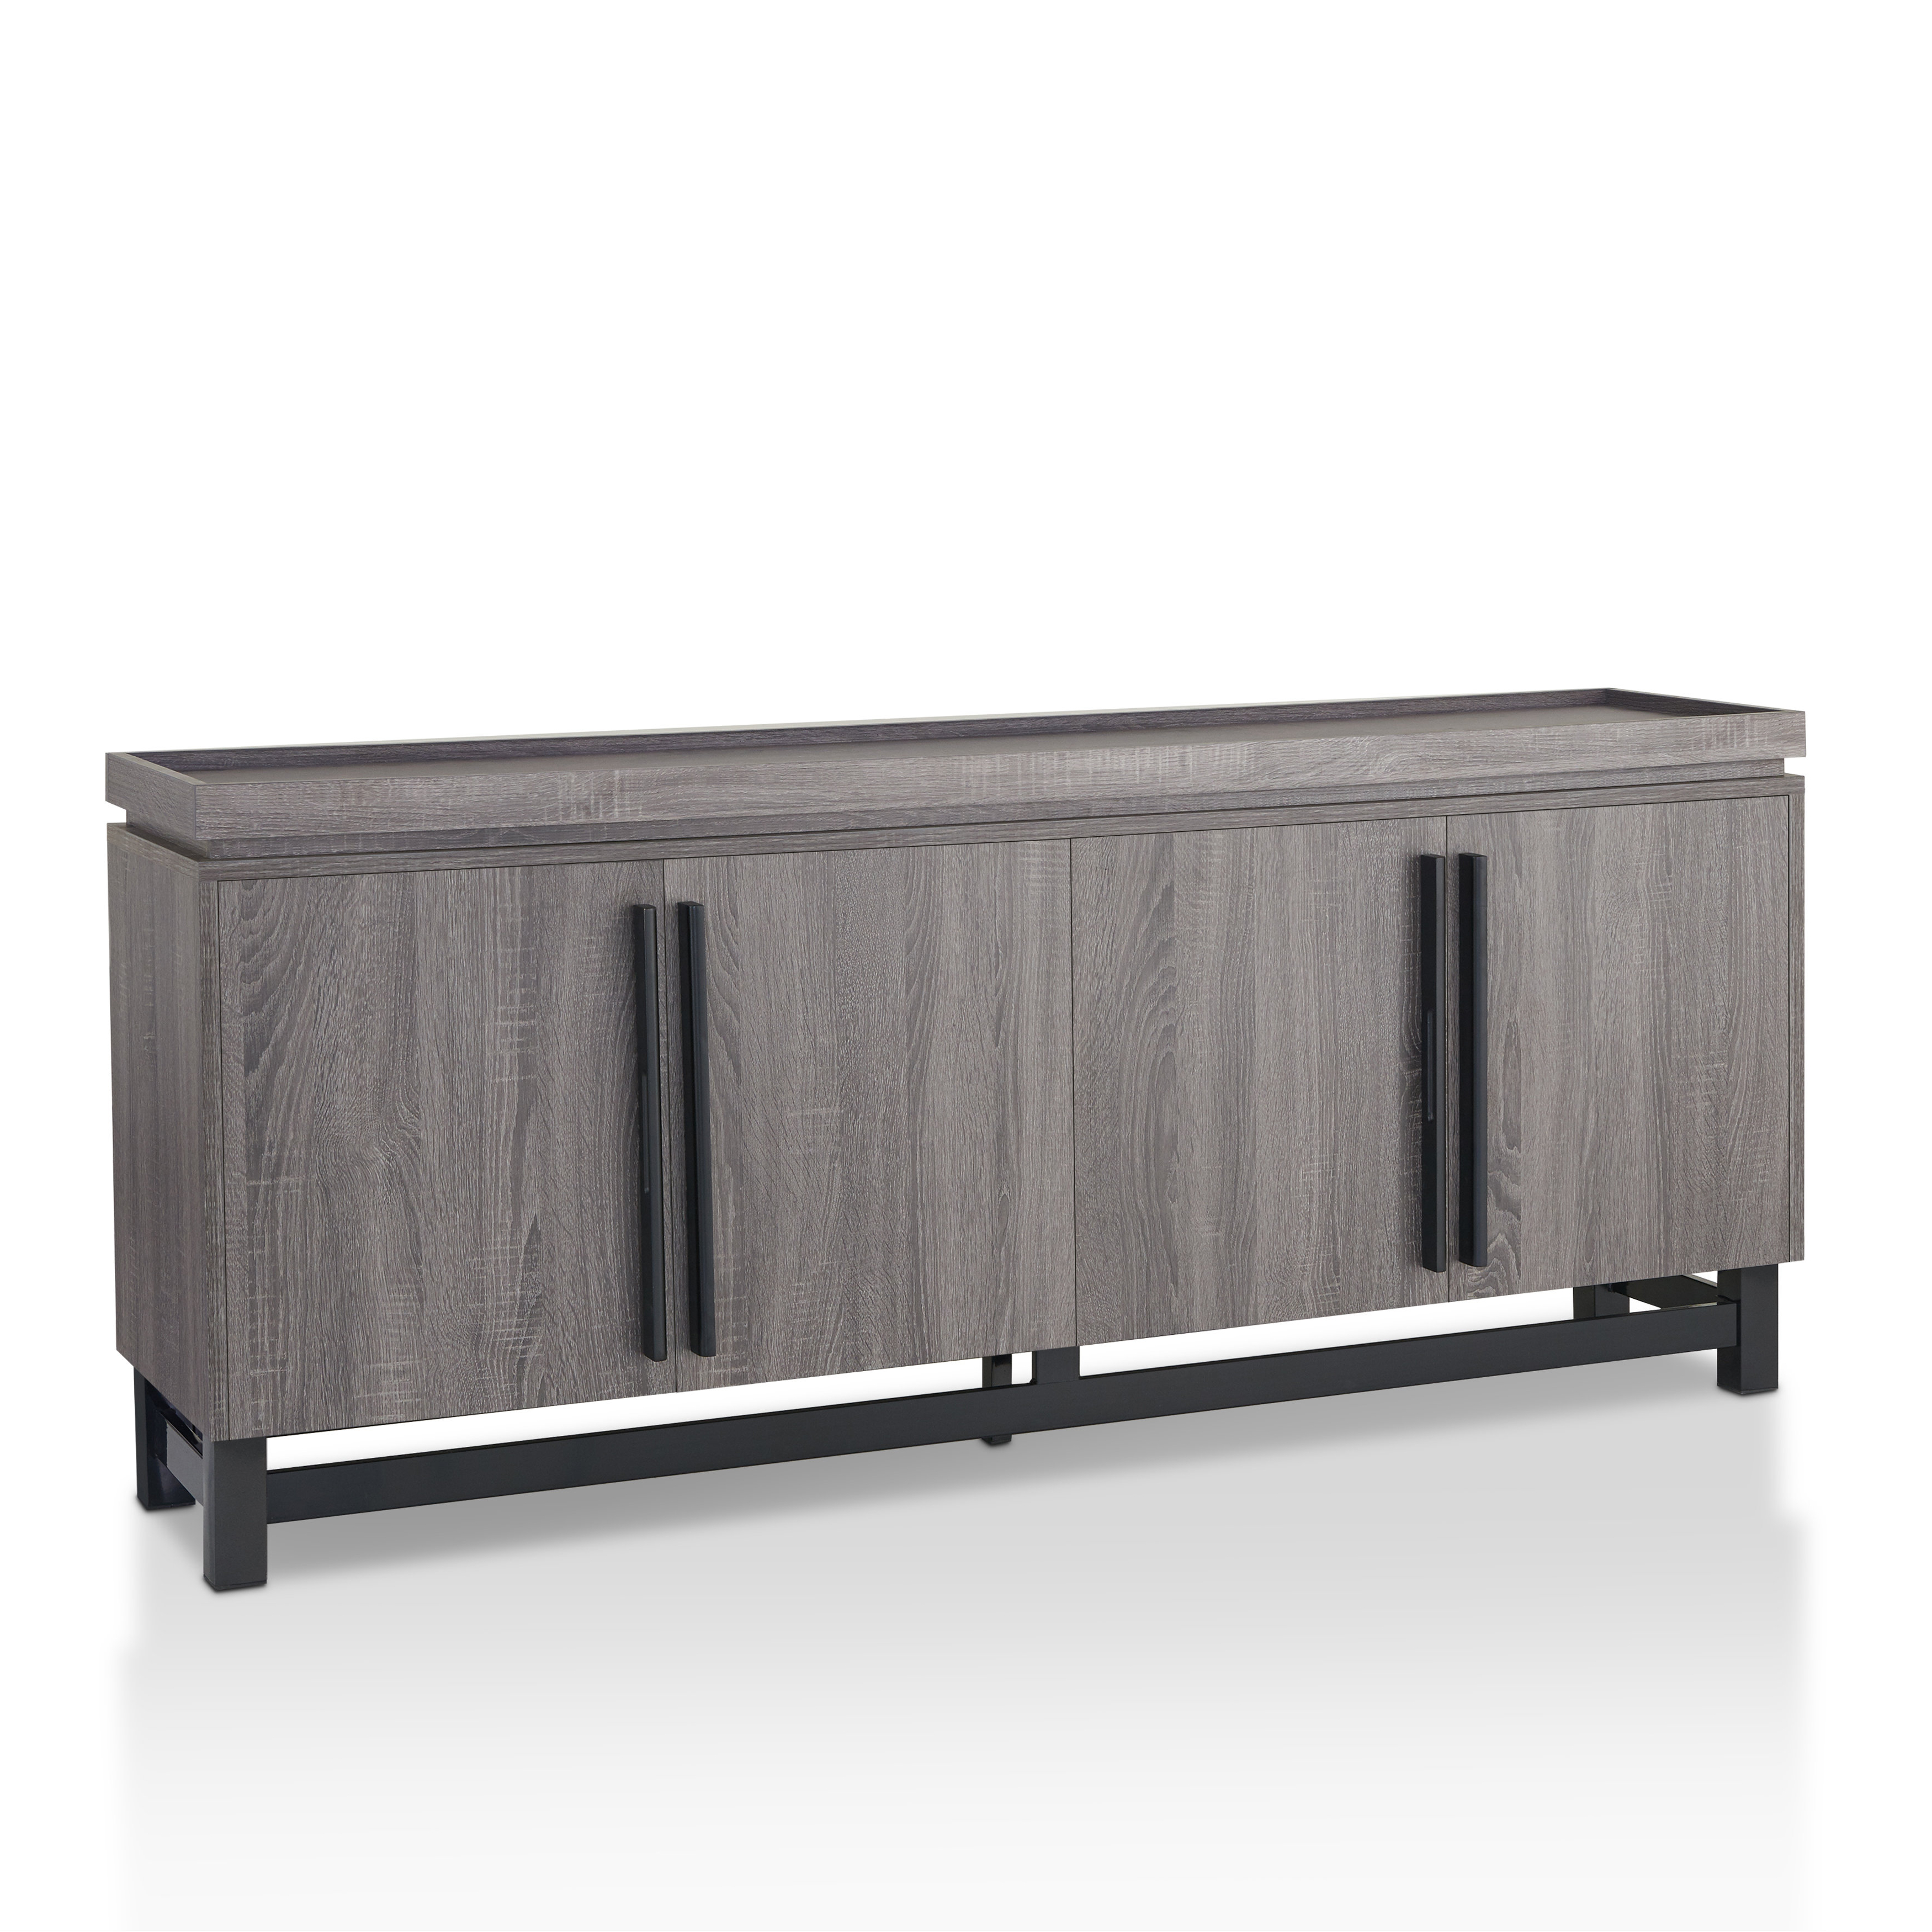 Grey Sideboards & Buffets | Joss & Main Regarding Cazenovia Charnley Sideboards (Gallery 18 of 20)